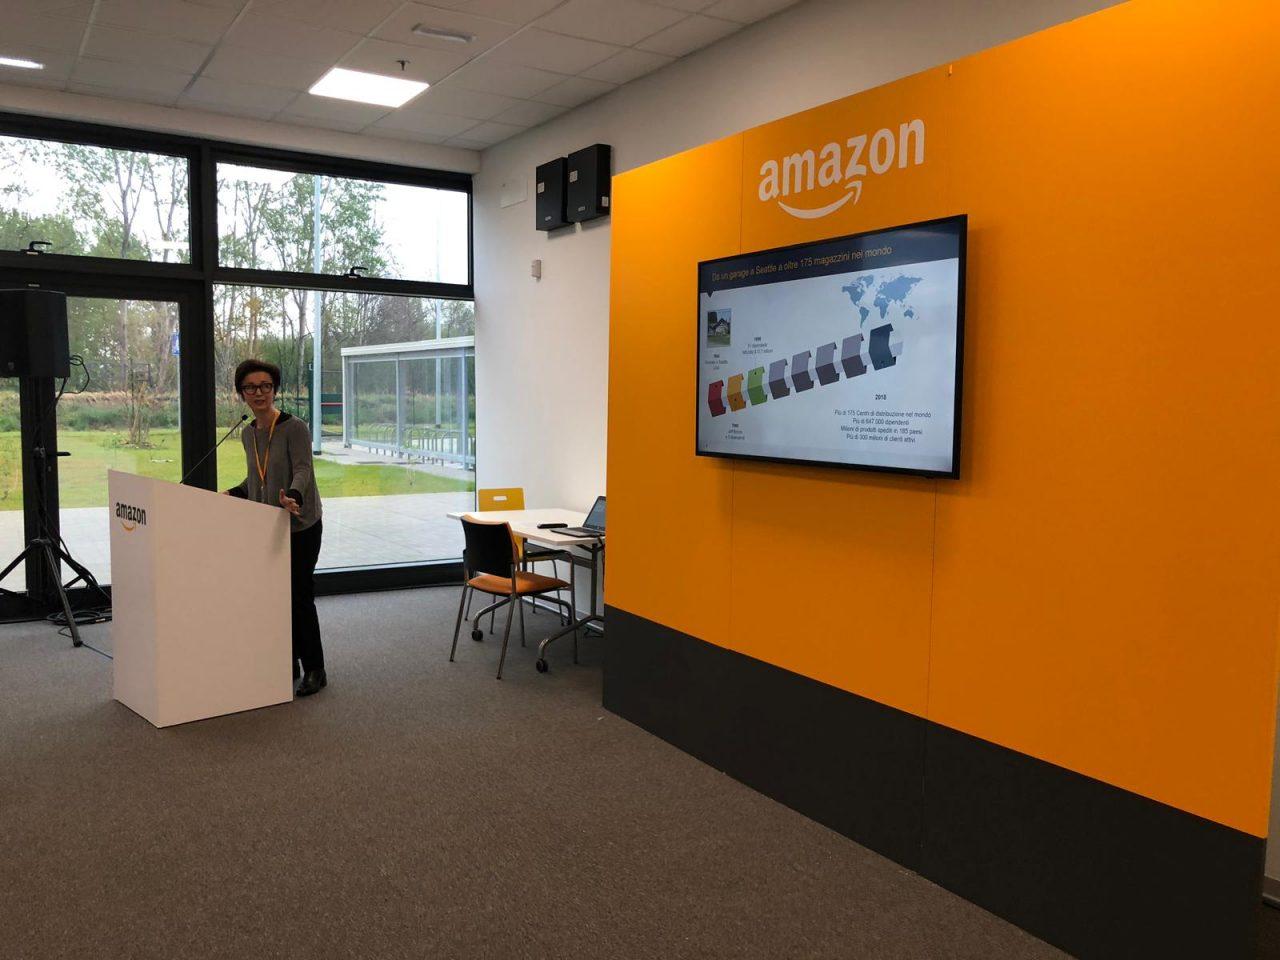 Amazon Torrazza